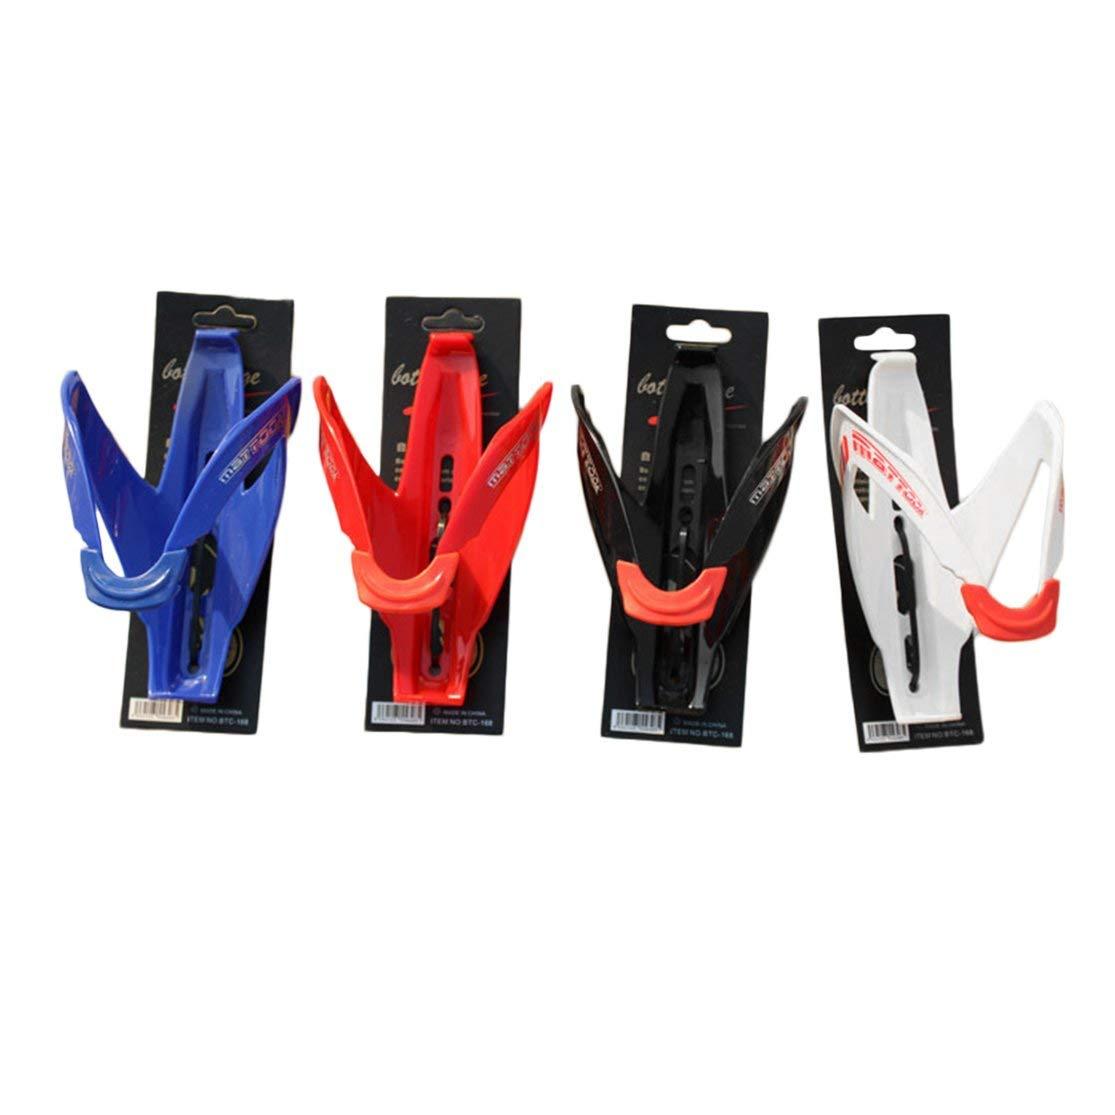 MTB Bike Bottle Rack Glass Fiber Botella de Agua Jaula Titular Accesorios para Bicicletas Kaemma